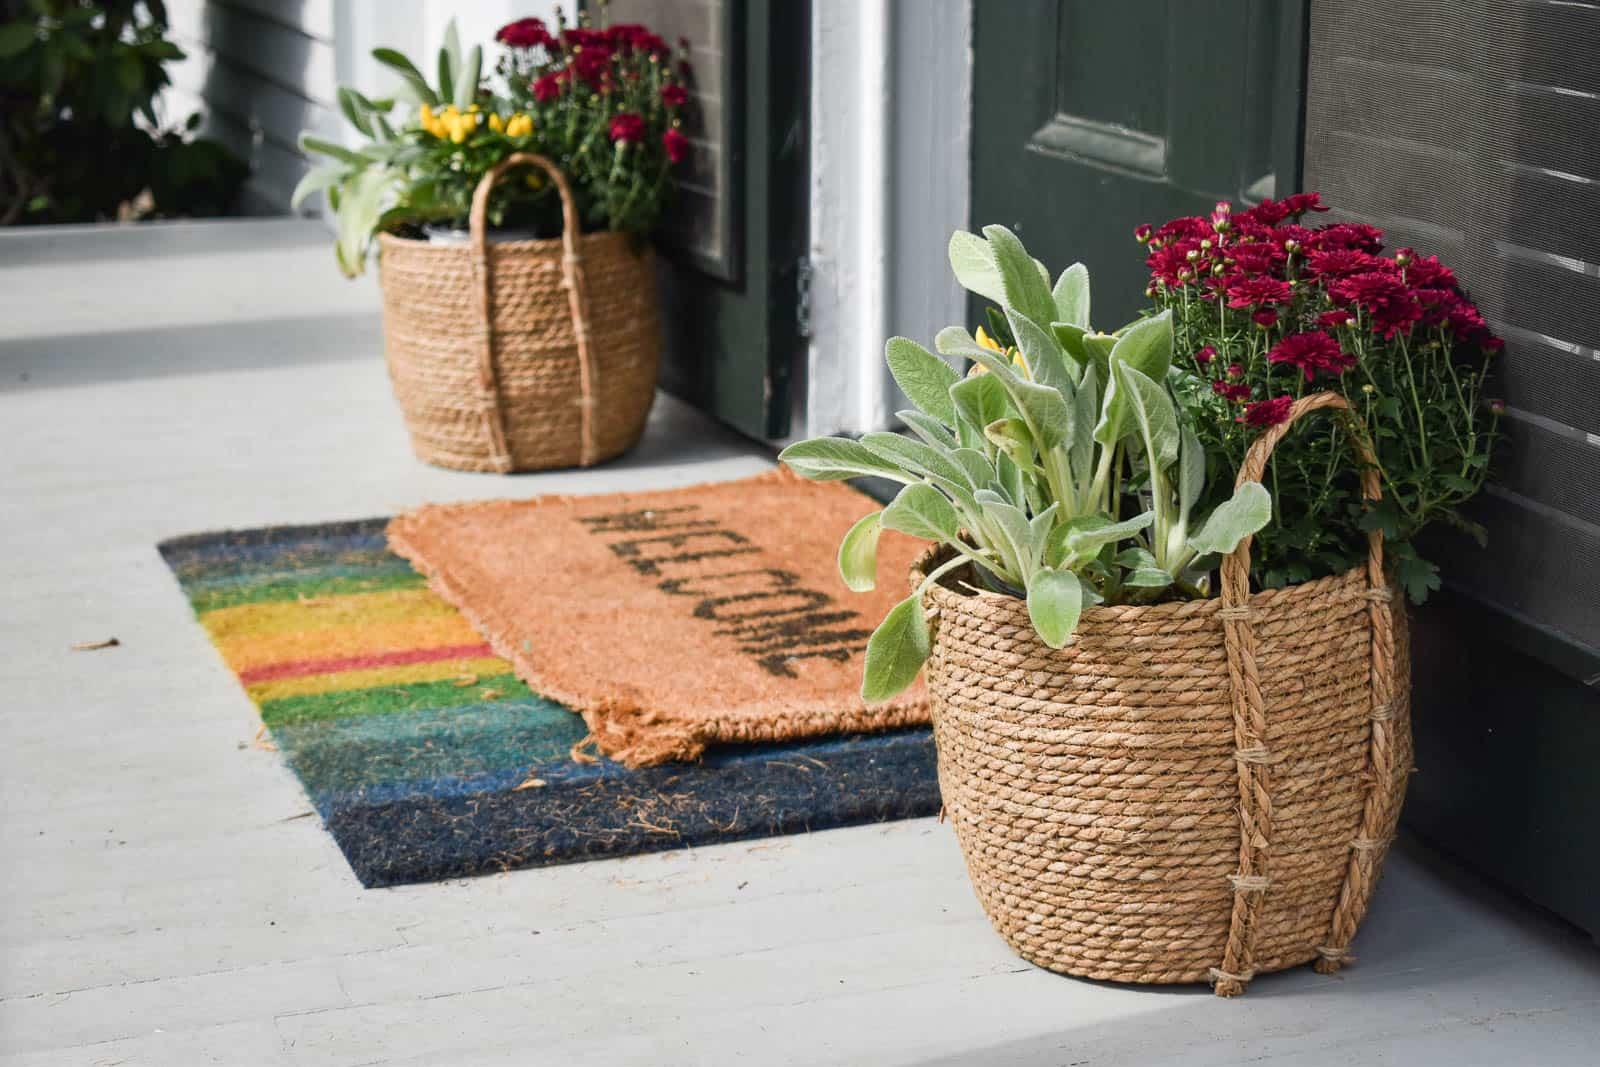 plants next to door on front porch